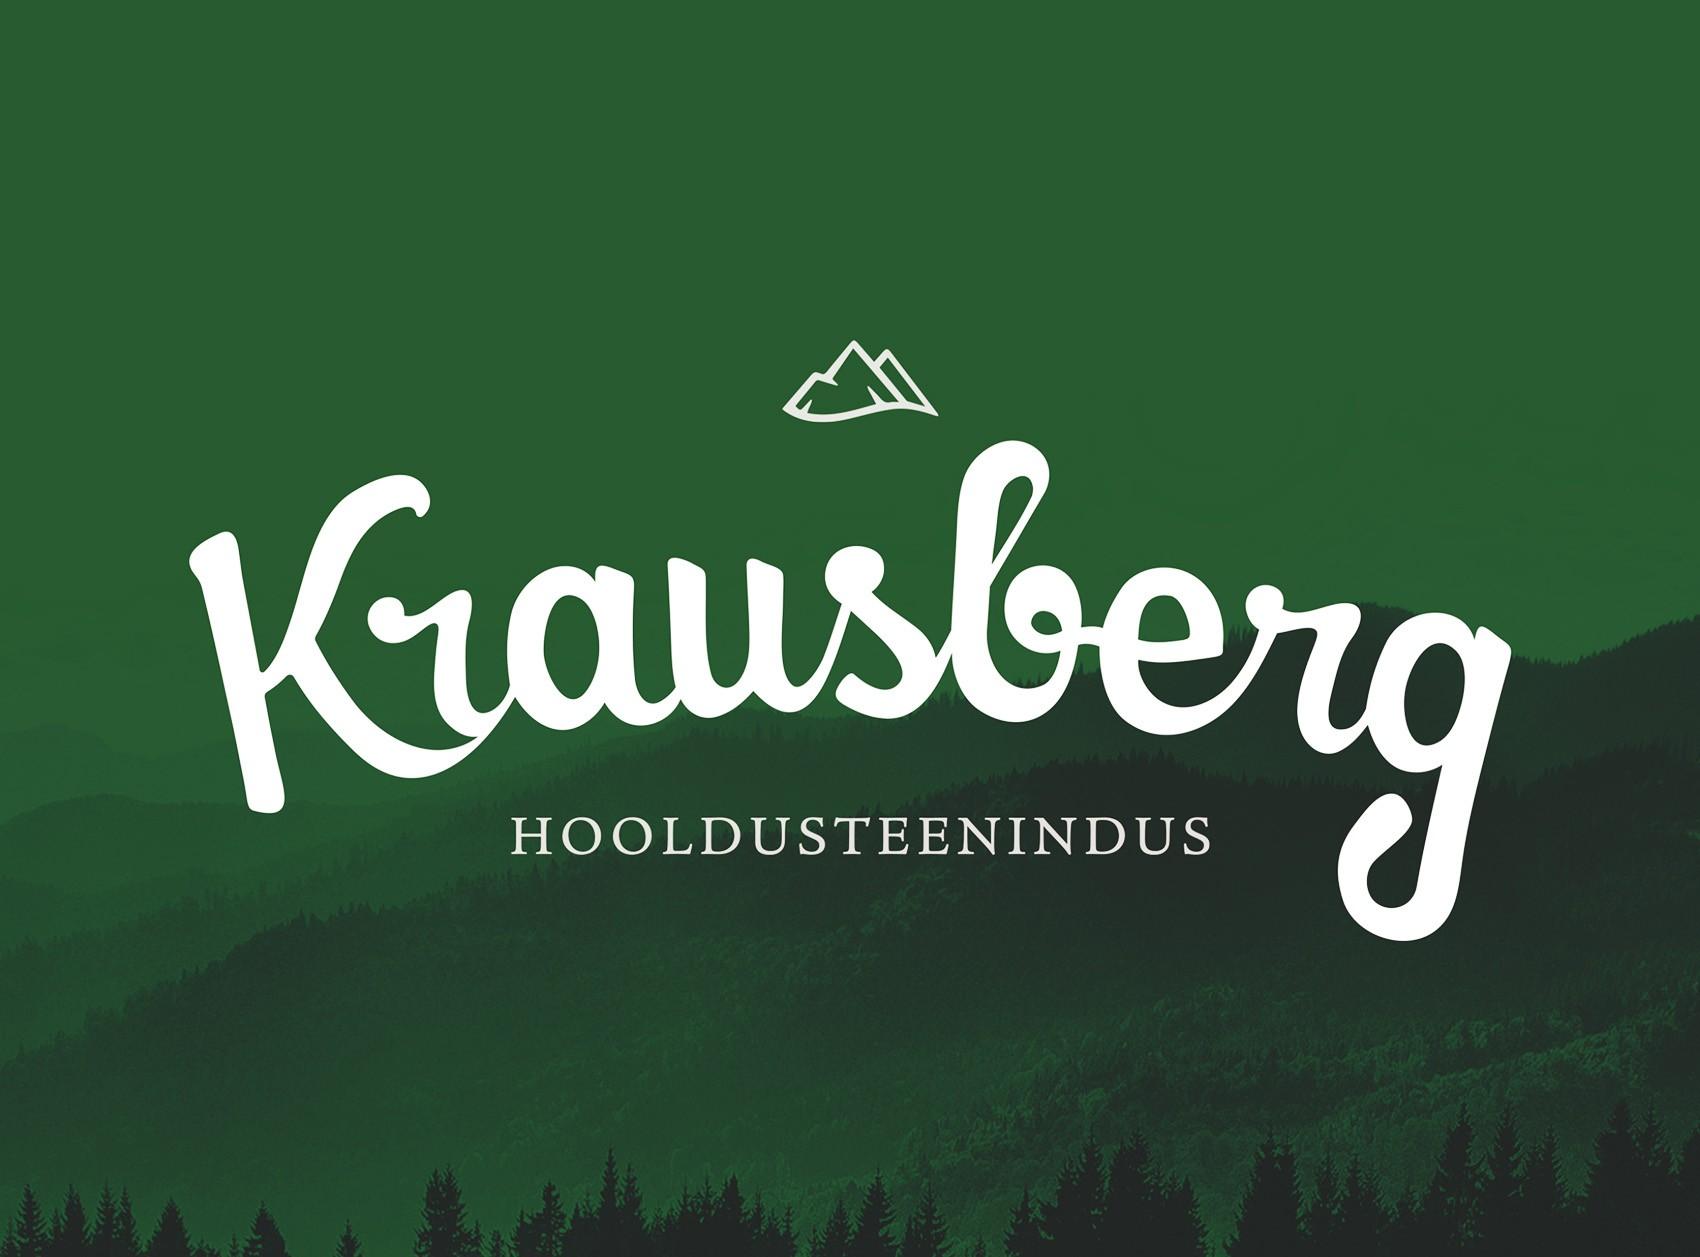 Identity design: Krausberg